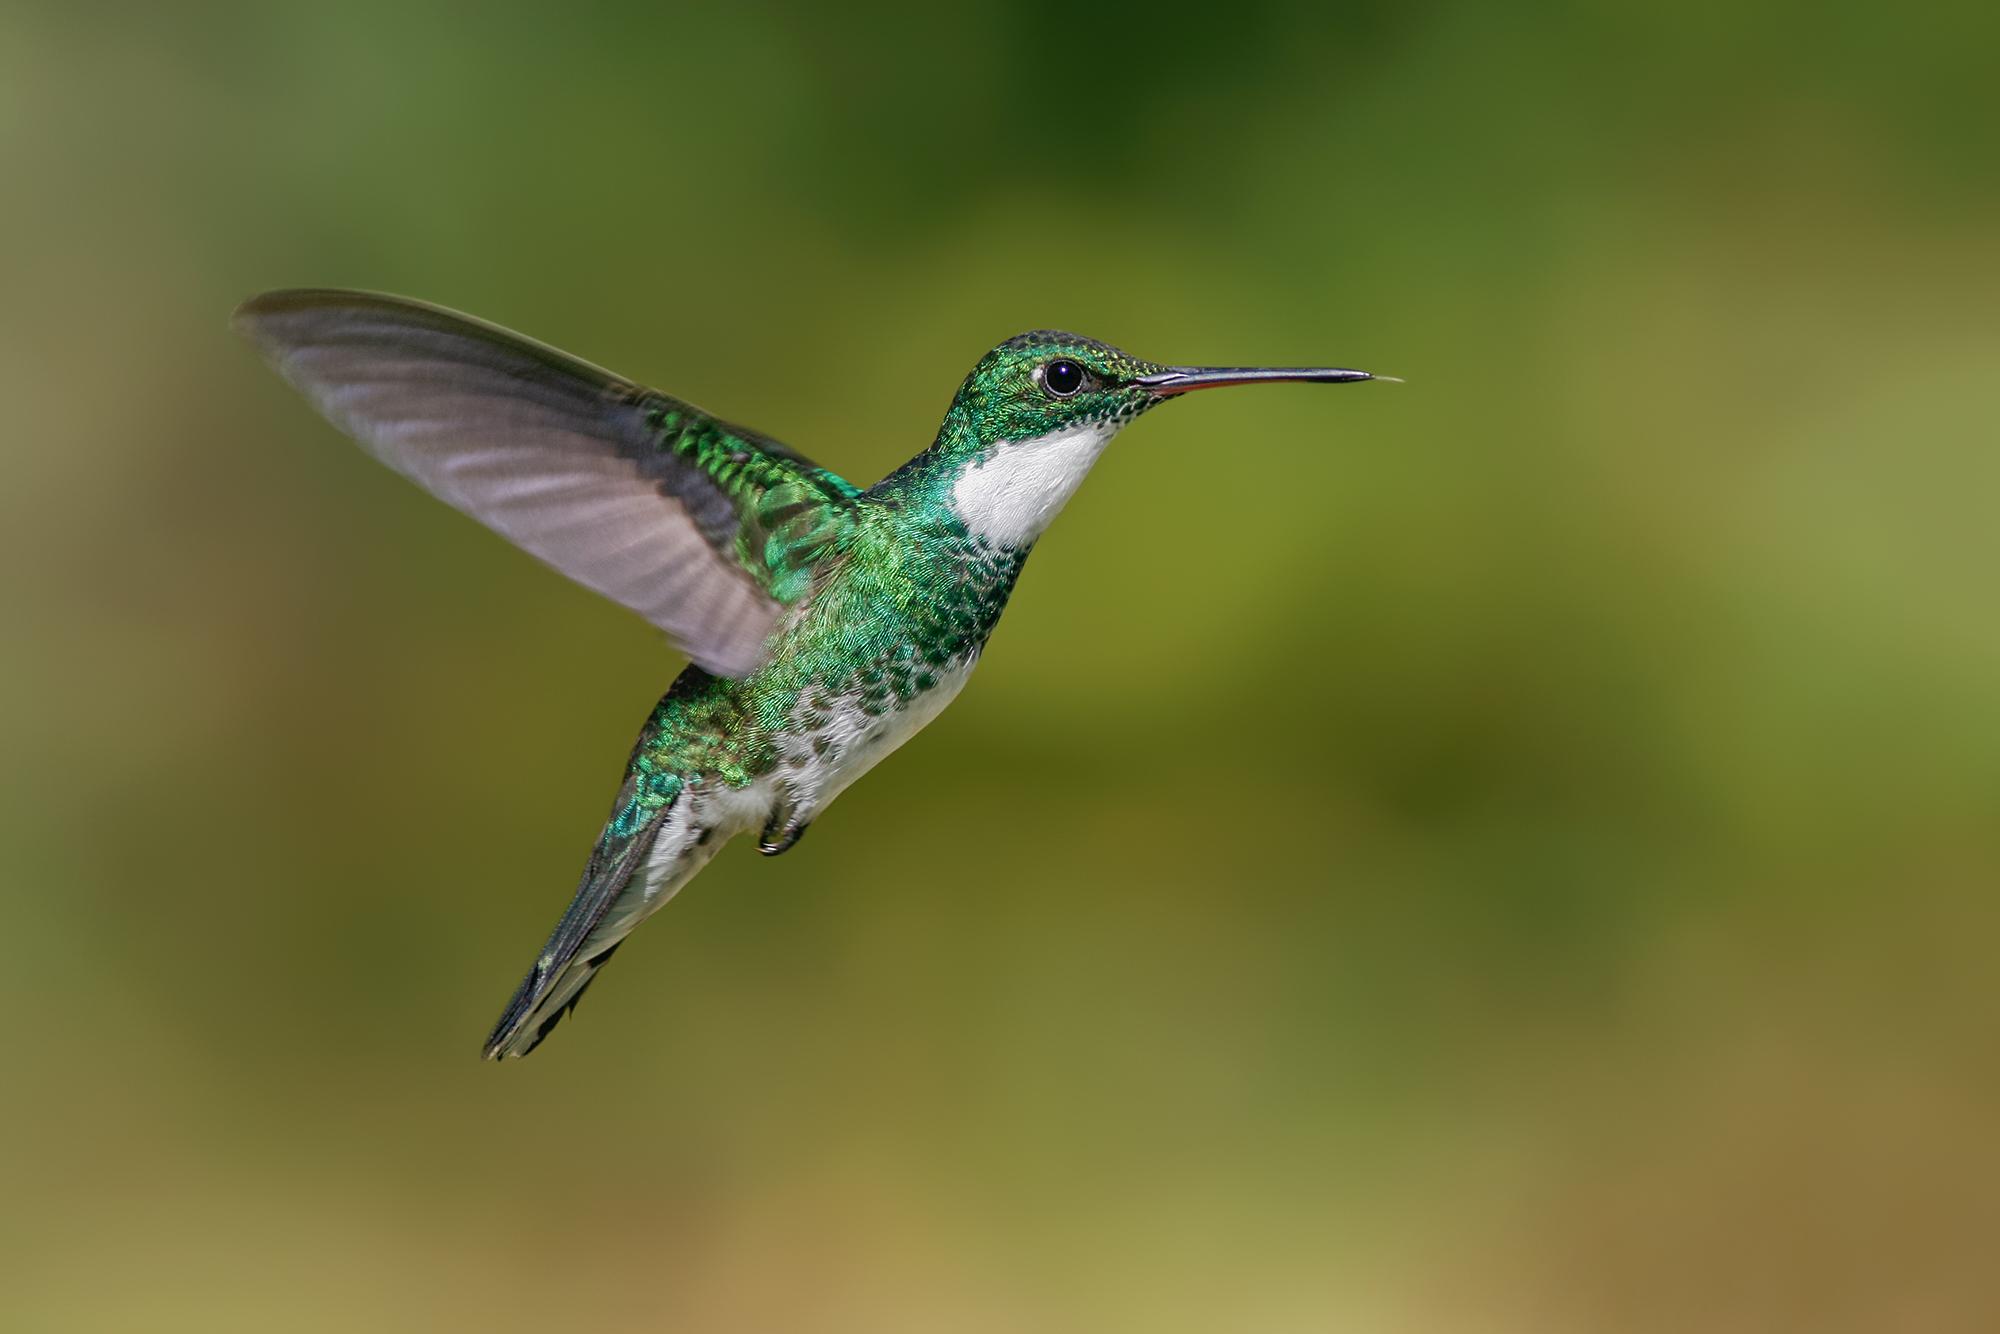 White-throated Hummingbird JPEG_web.jpg